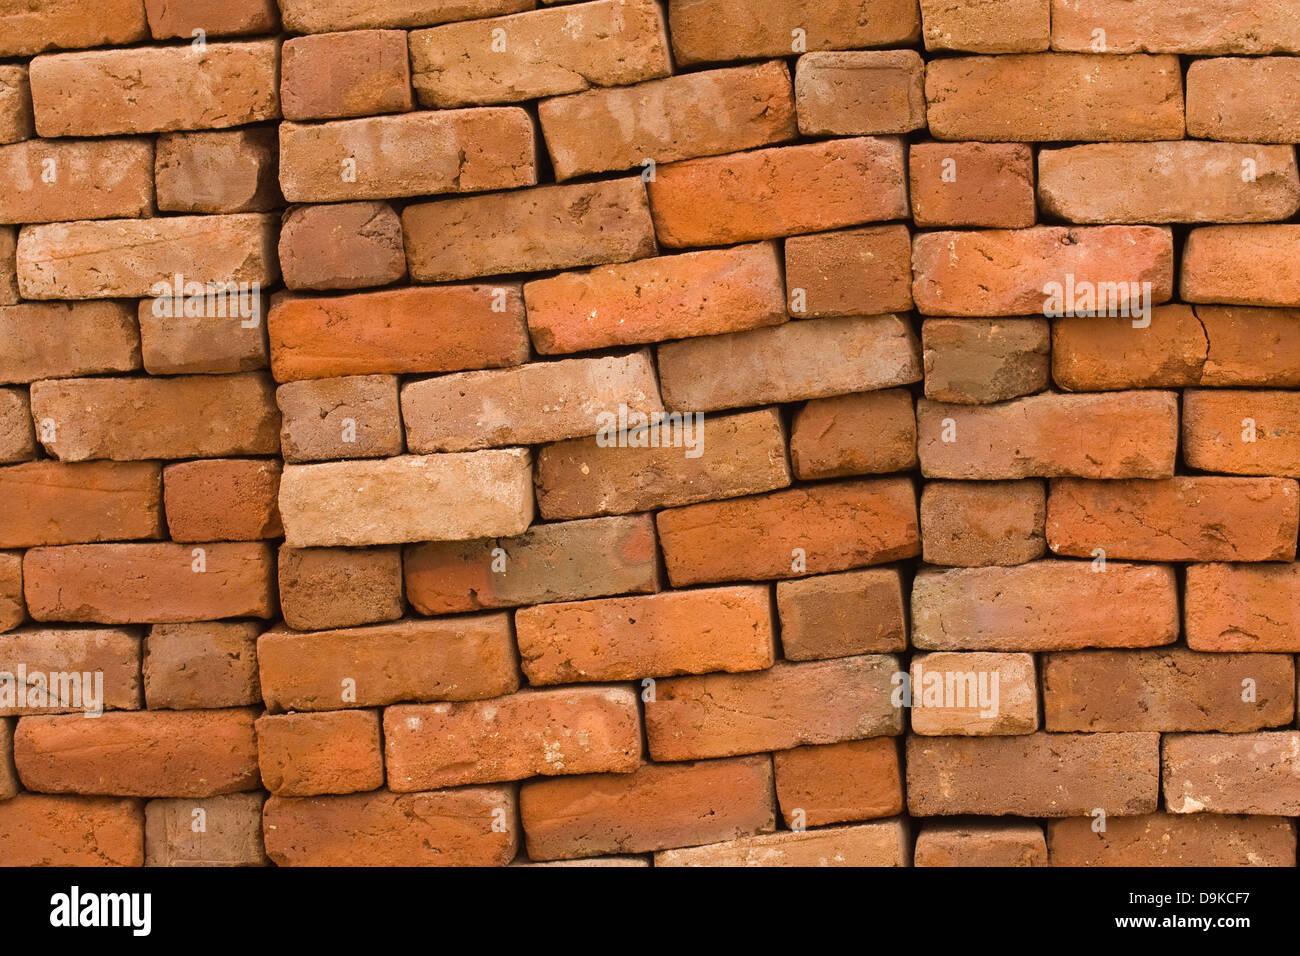 Asia, India, Tamil Nadu, Kanchipuram, piled red bricks - Stock Image